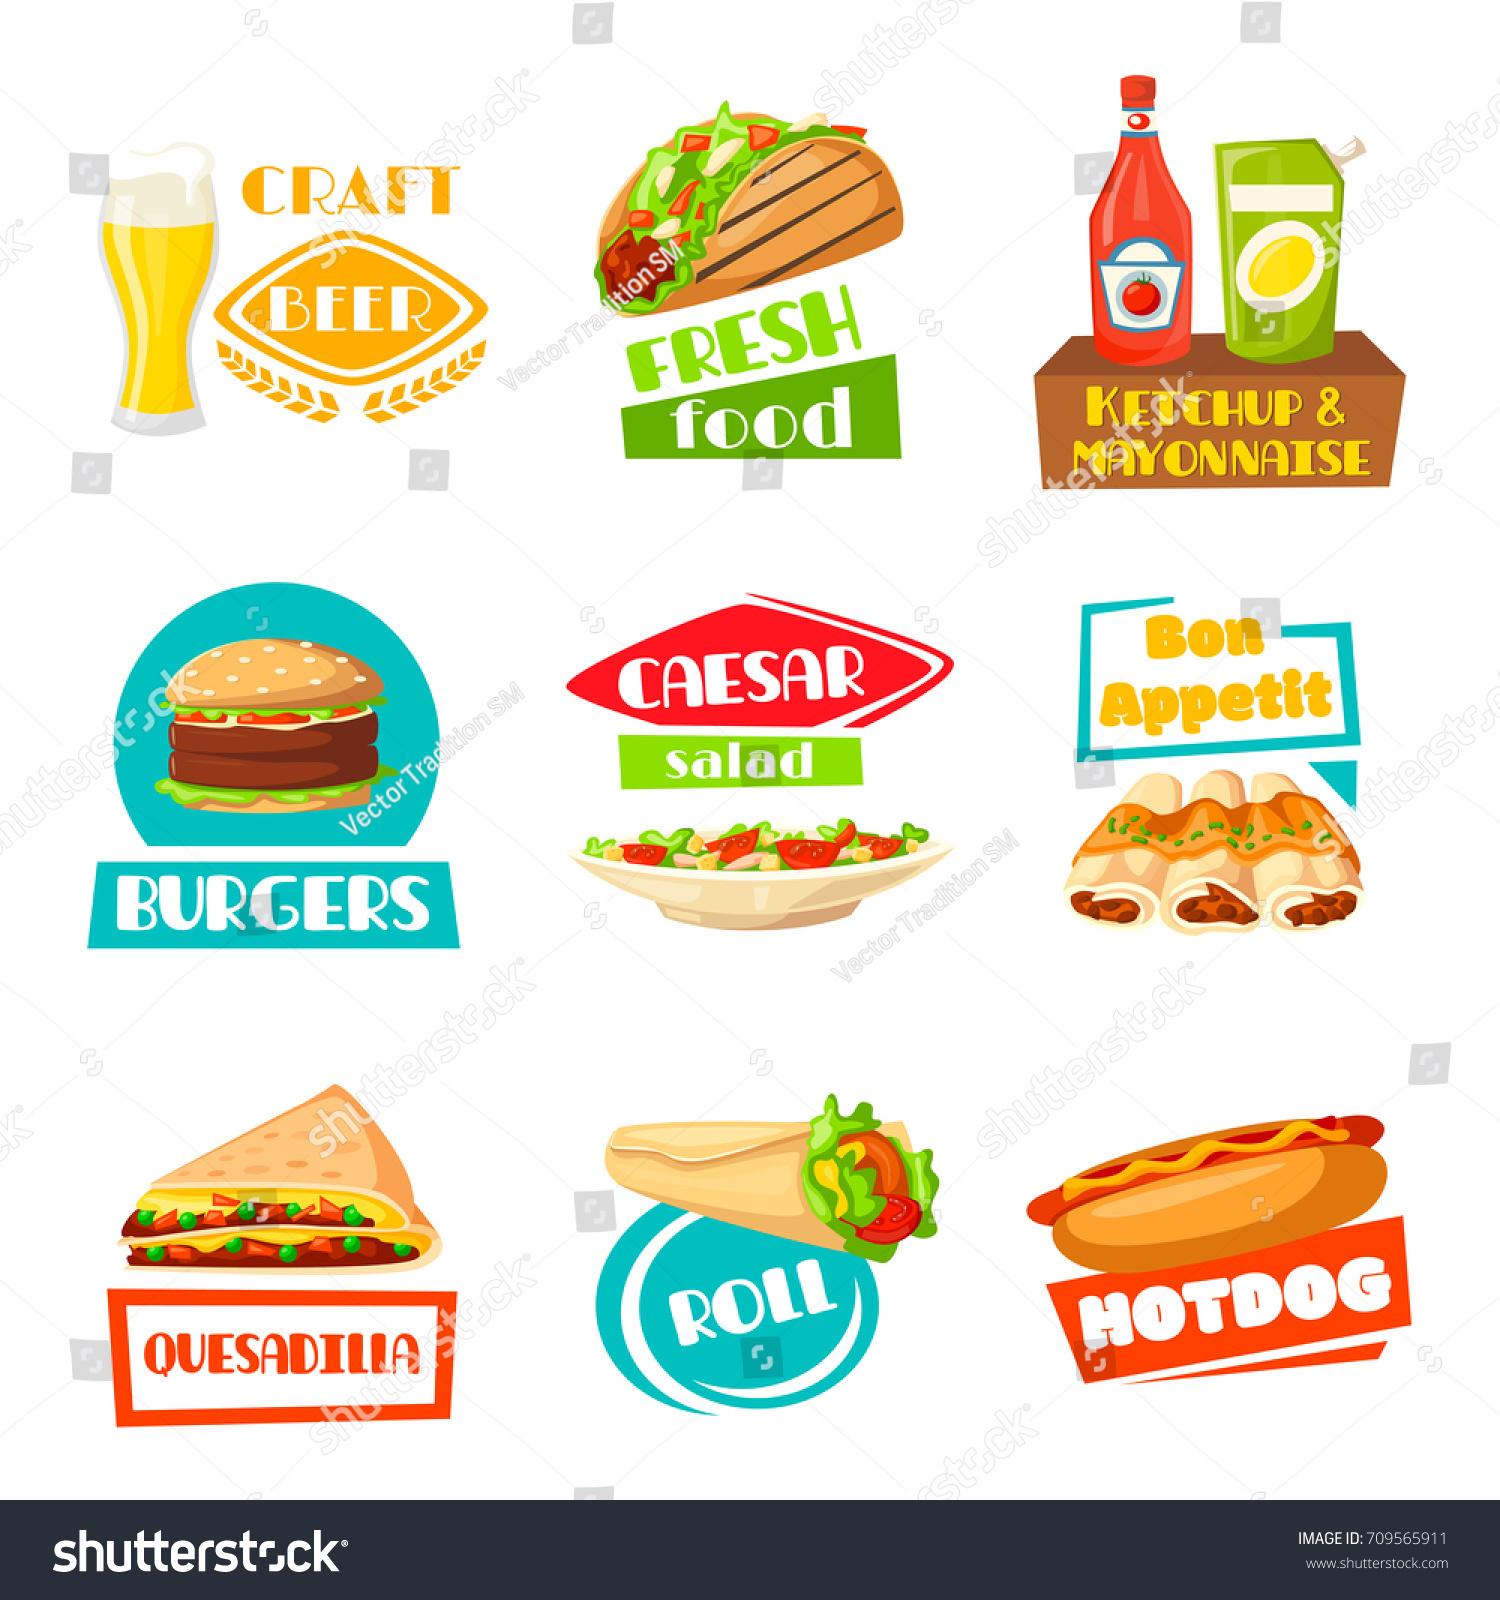 fast food meals icons menu template のベクター画像素材